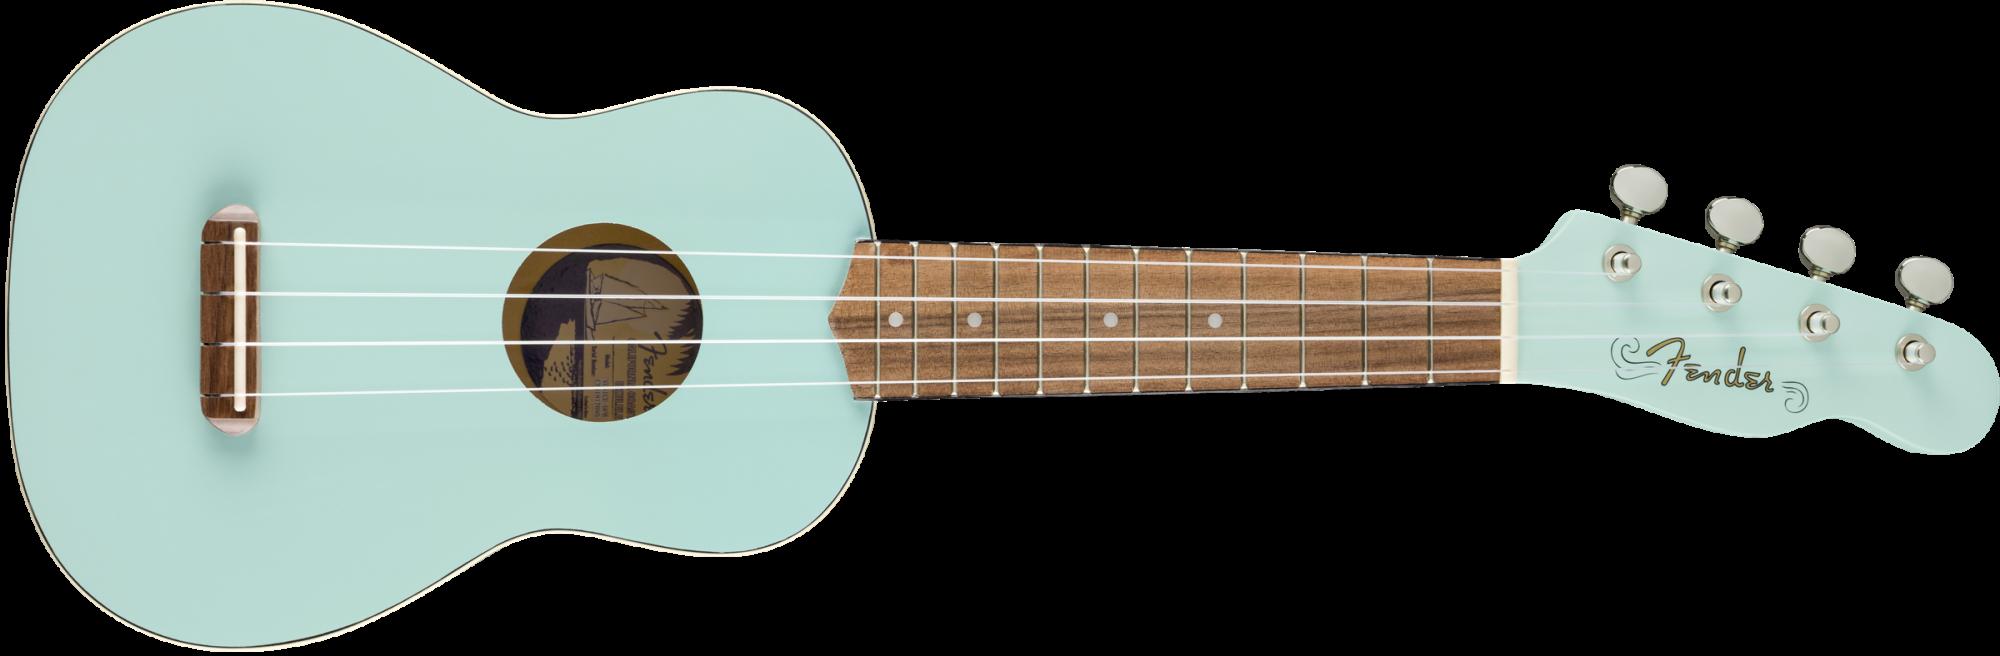 Fender Venice Soprano Ukulele, Walnut Fingerboard, Daphne Blue